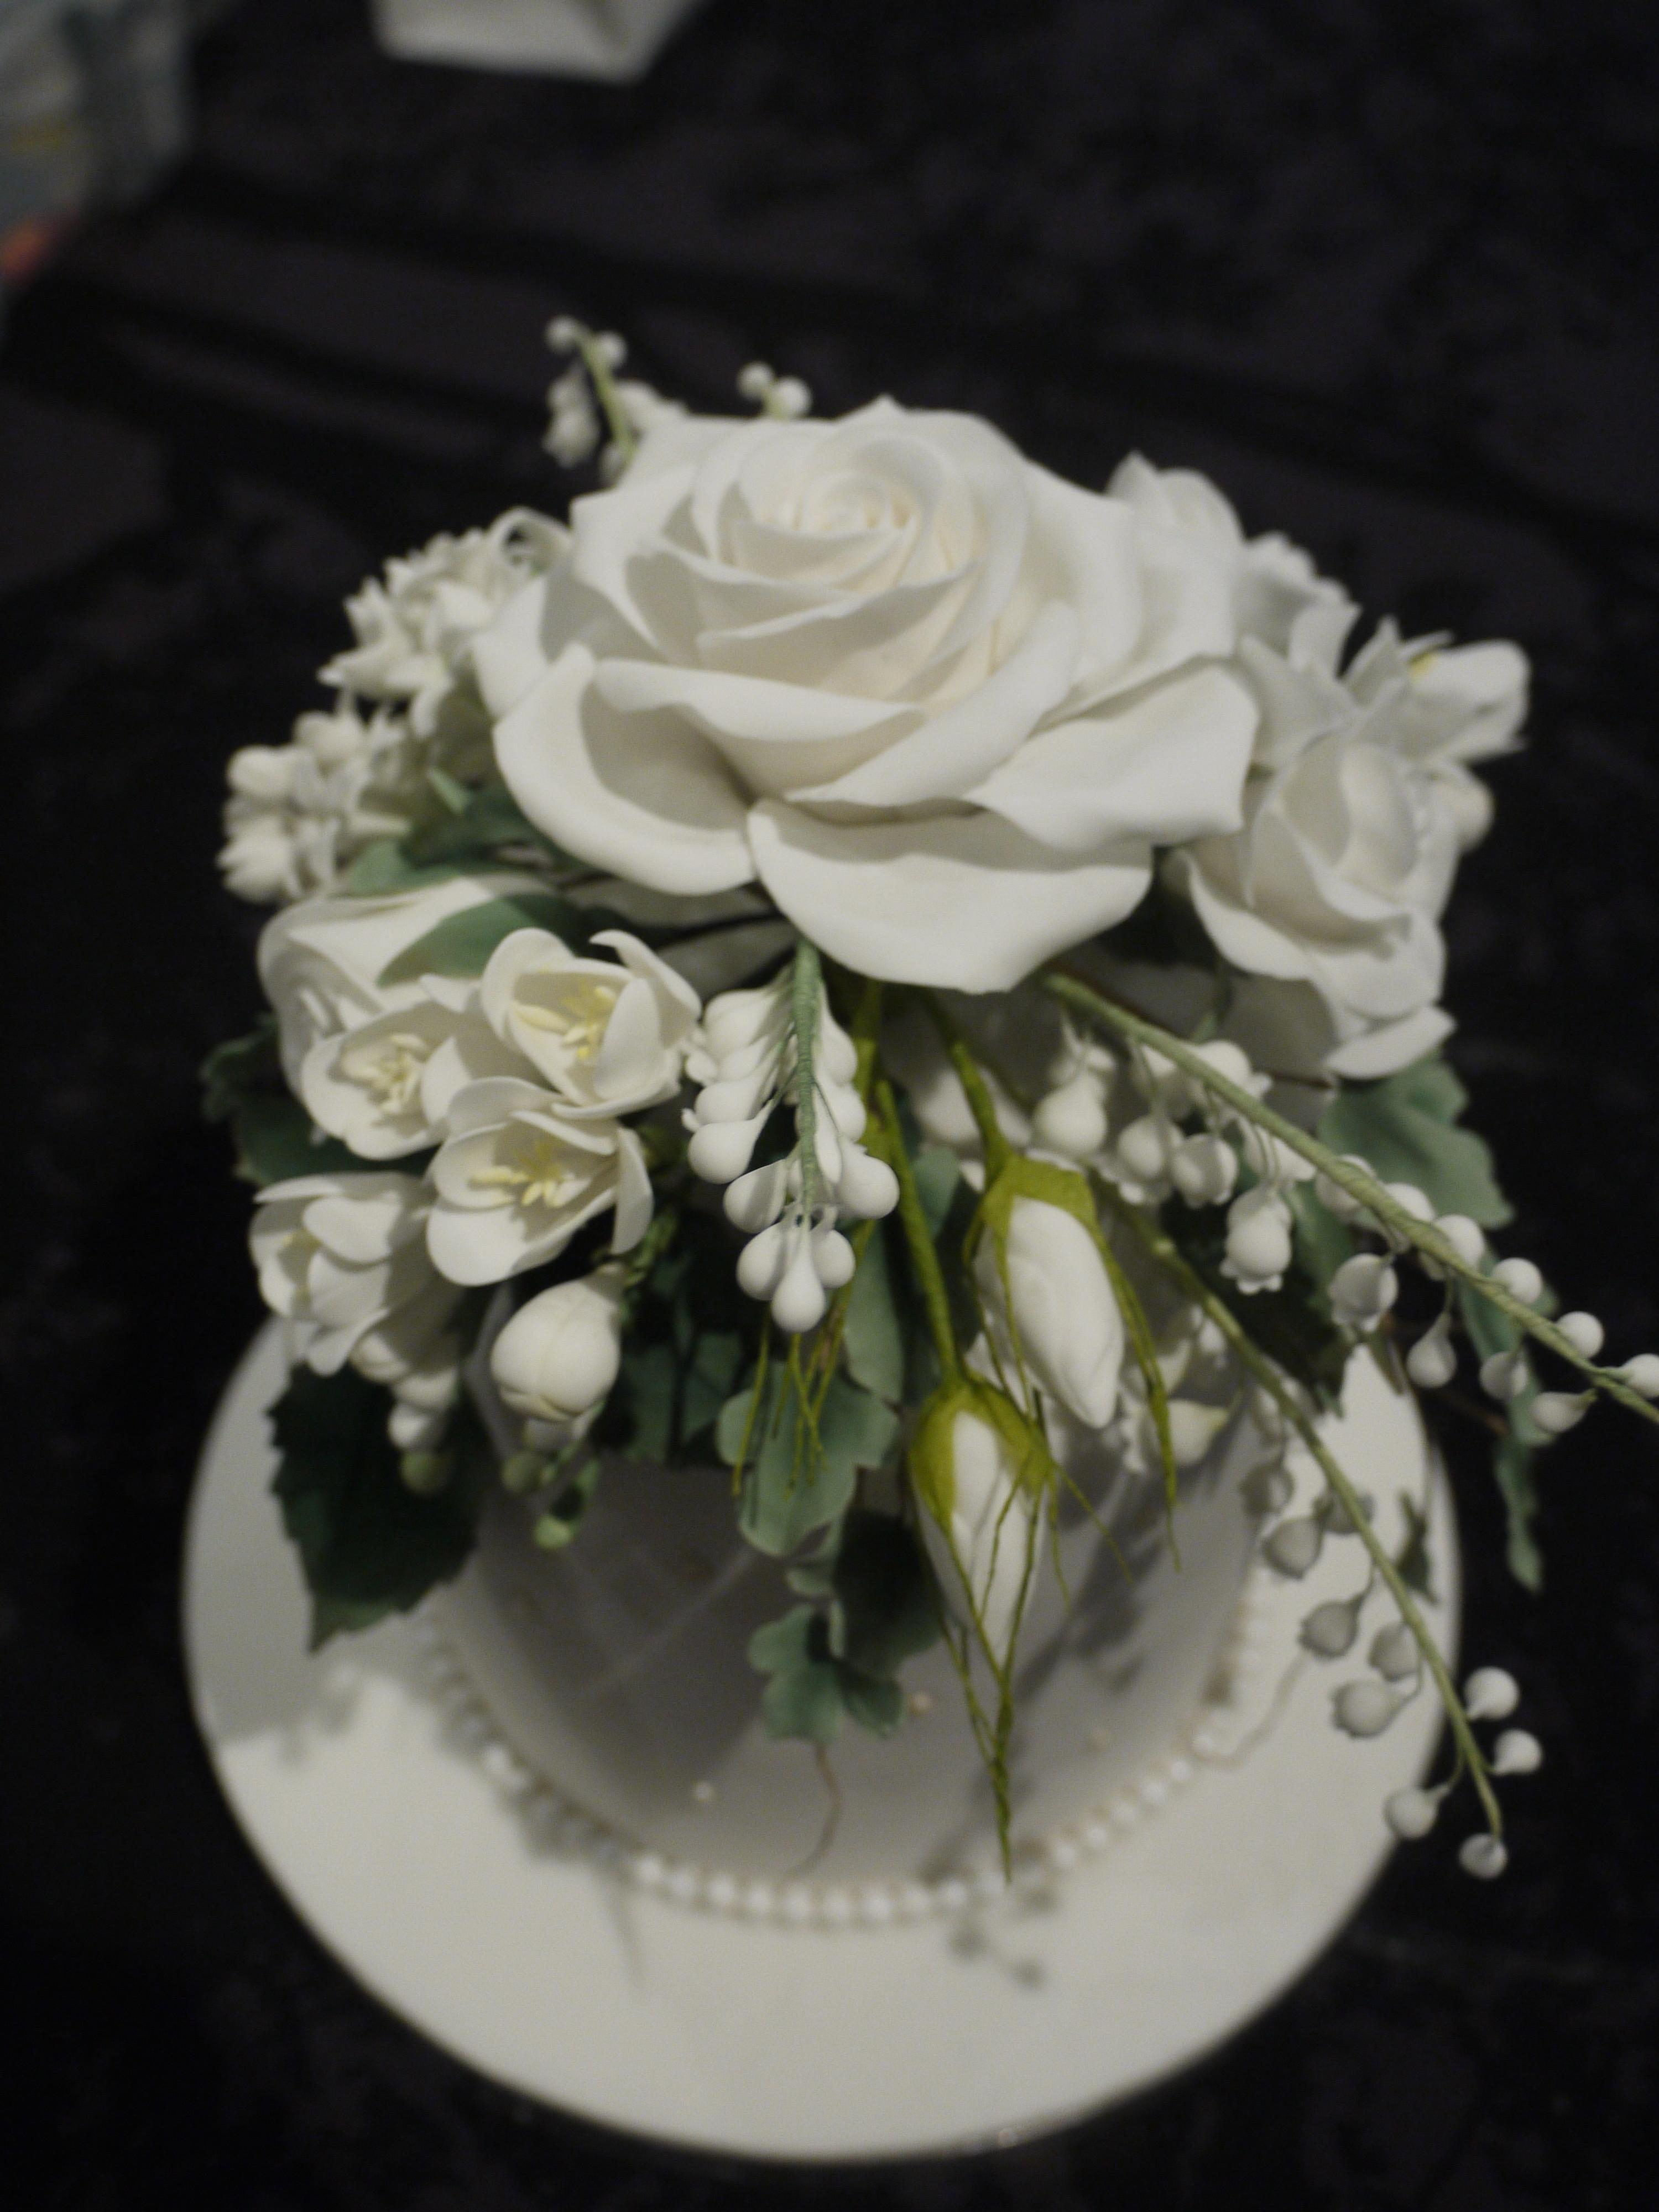 Sugar Flowers Wedding Cakes  Sugar Flowers Wedding Cake CakeCentral